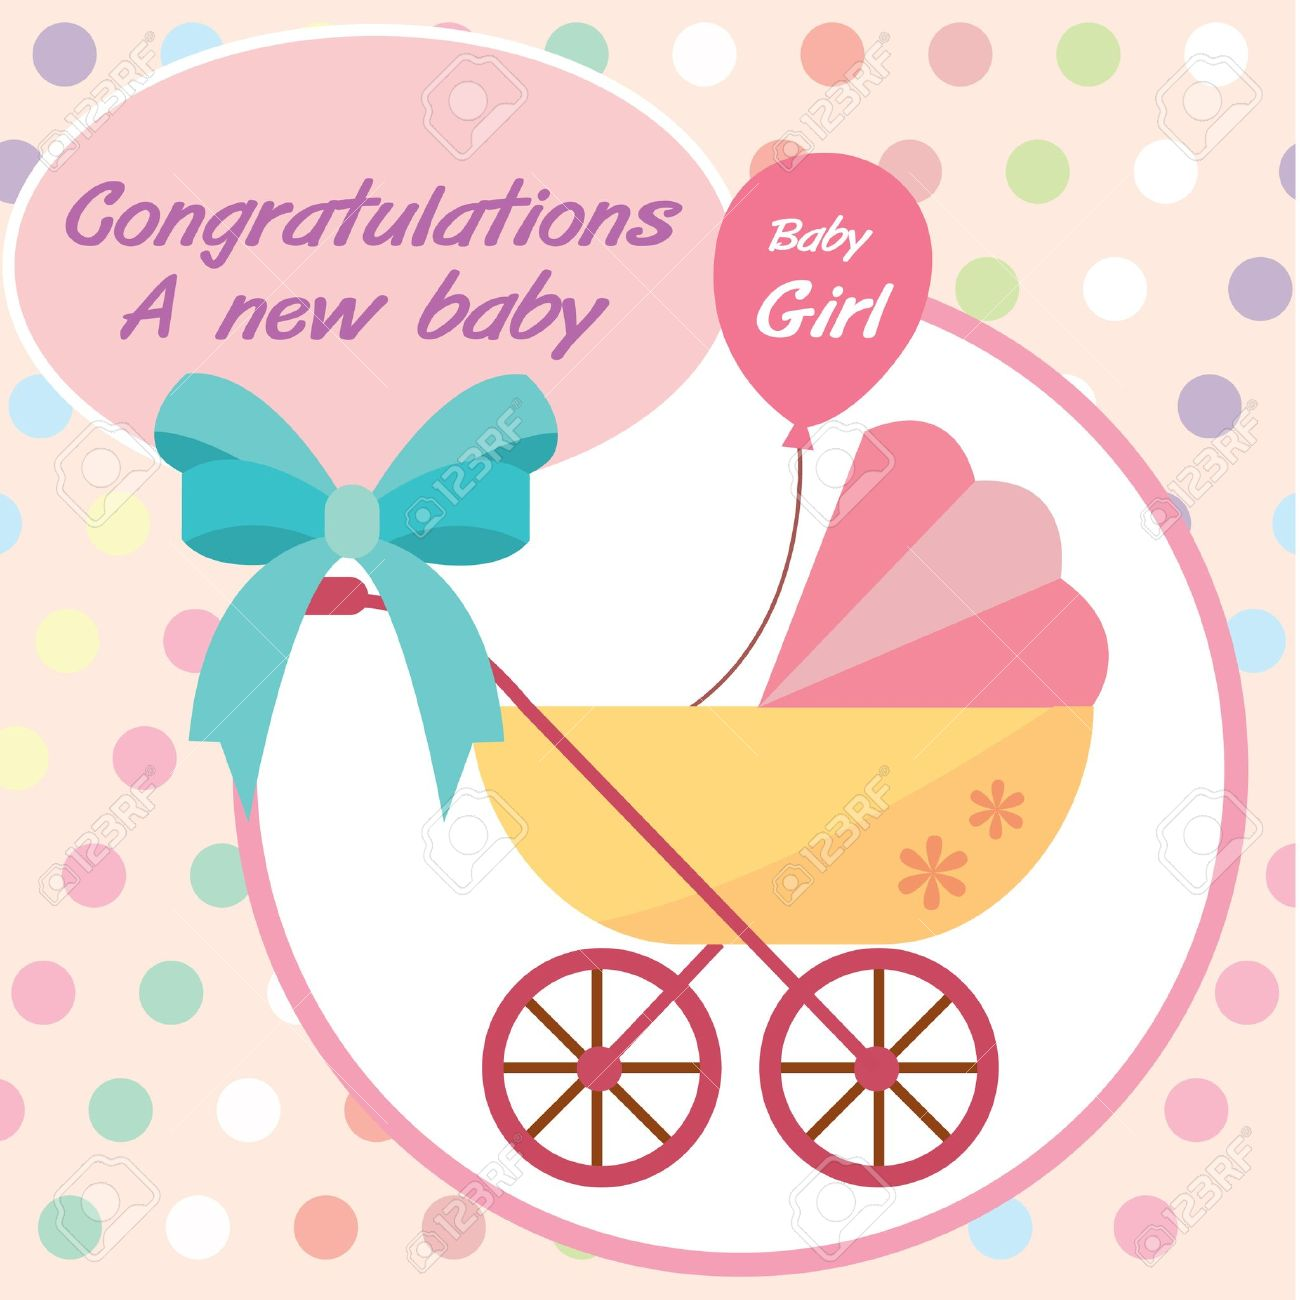 Baby Girl Congratulations Clipart